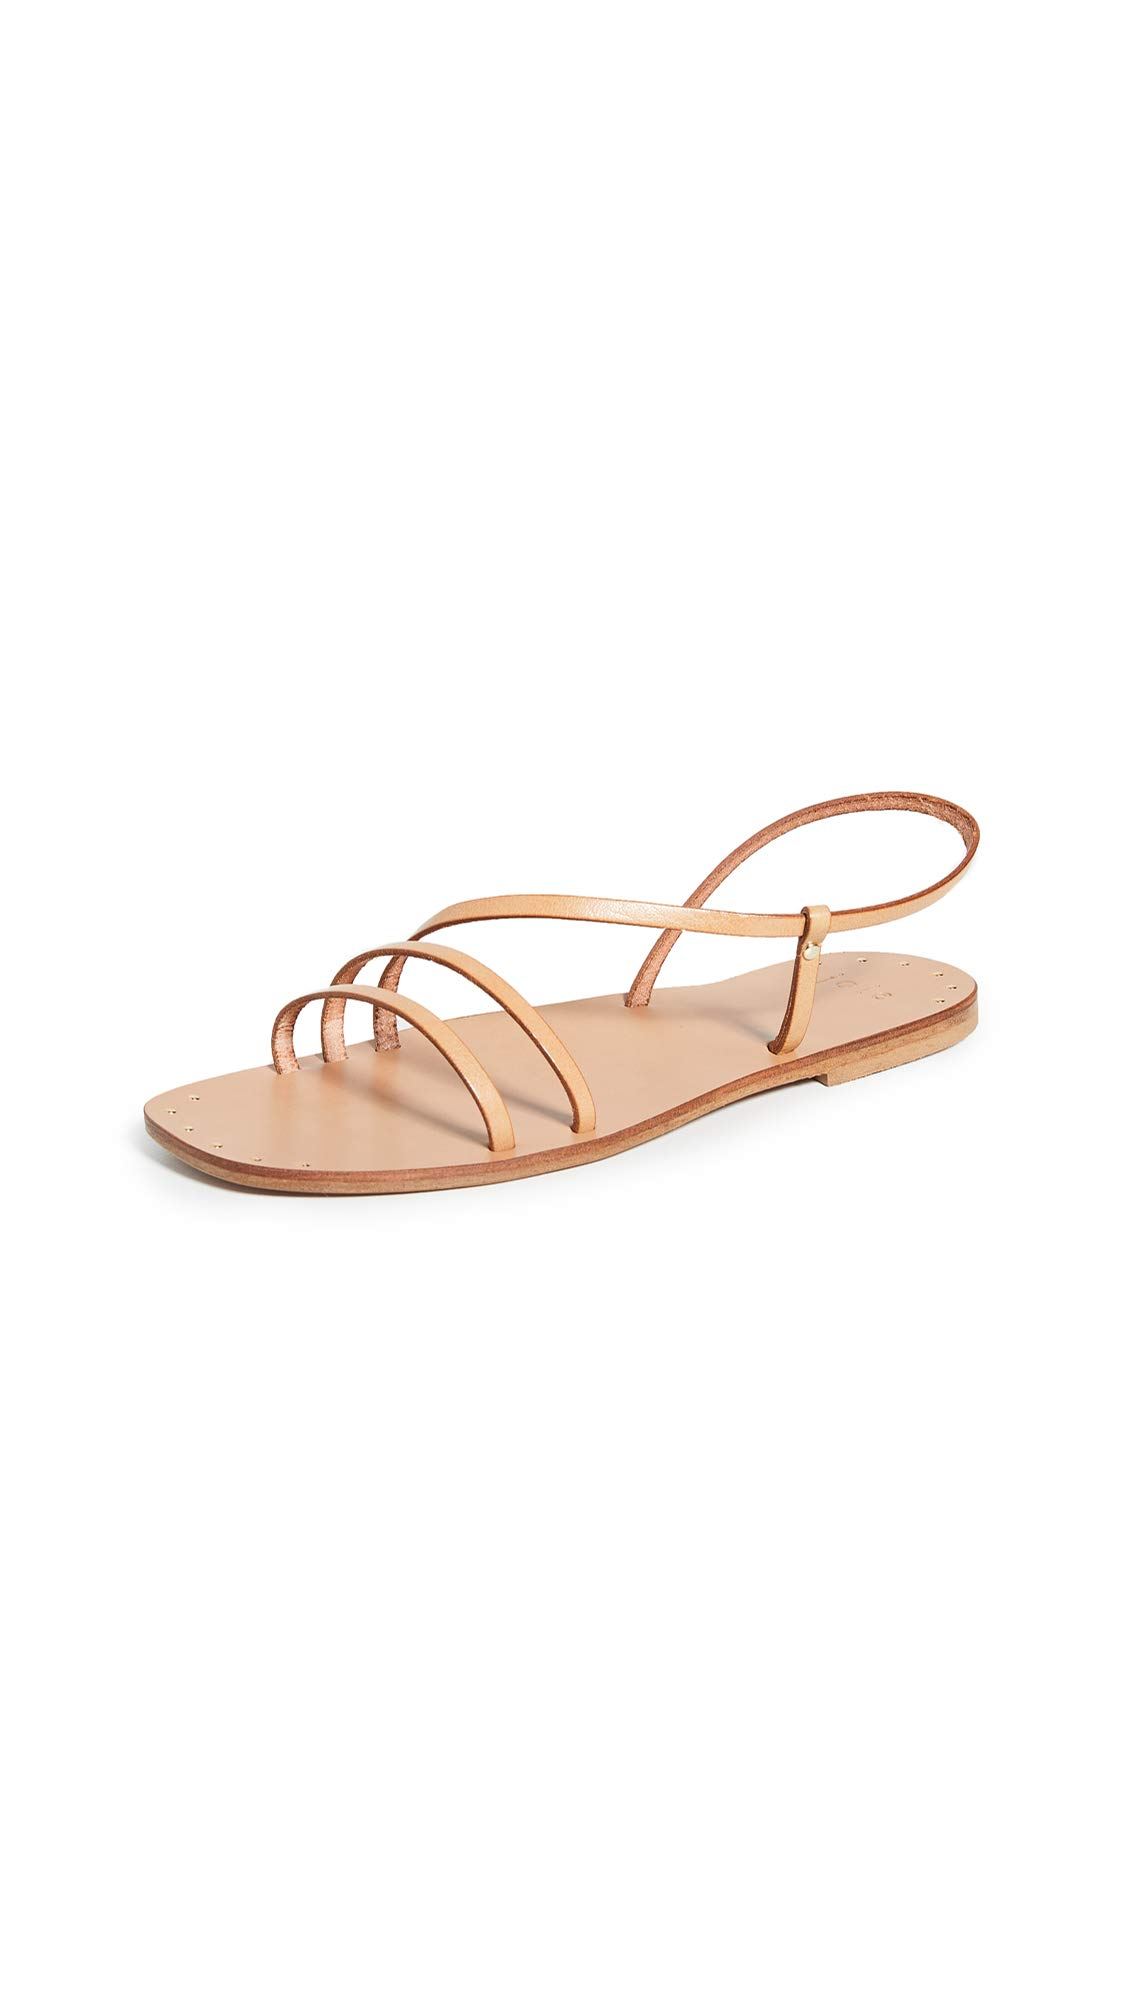 Joie Women's Baja Flat Sandals